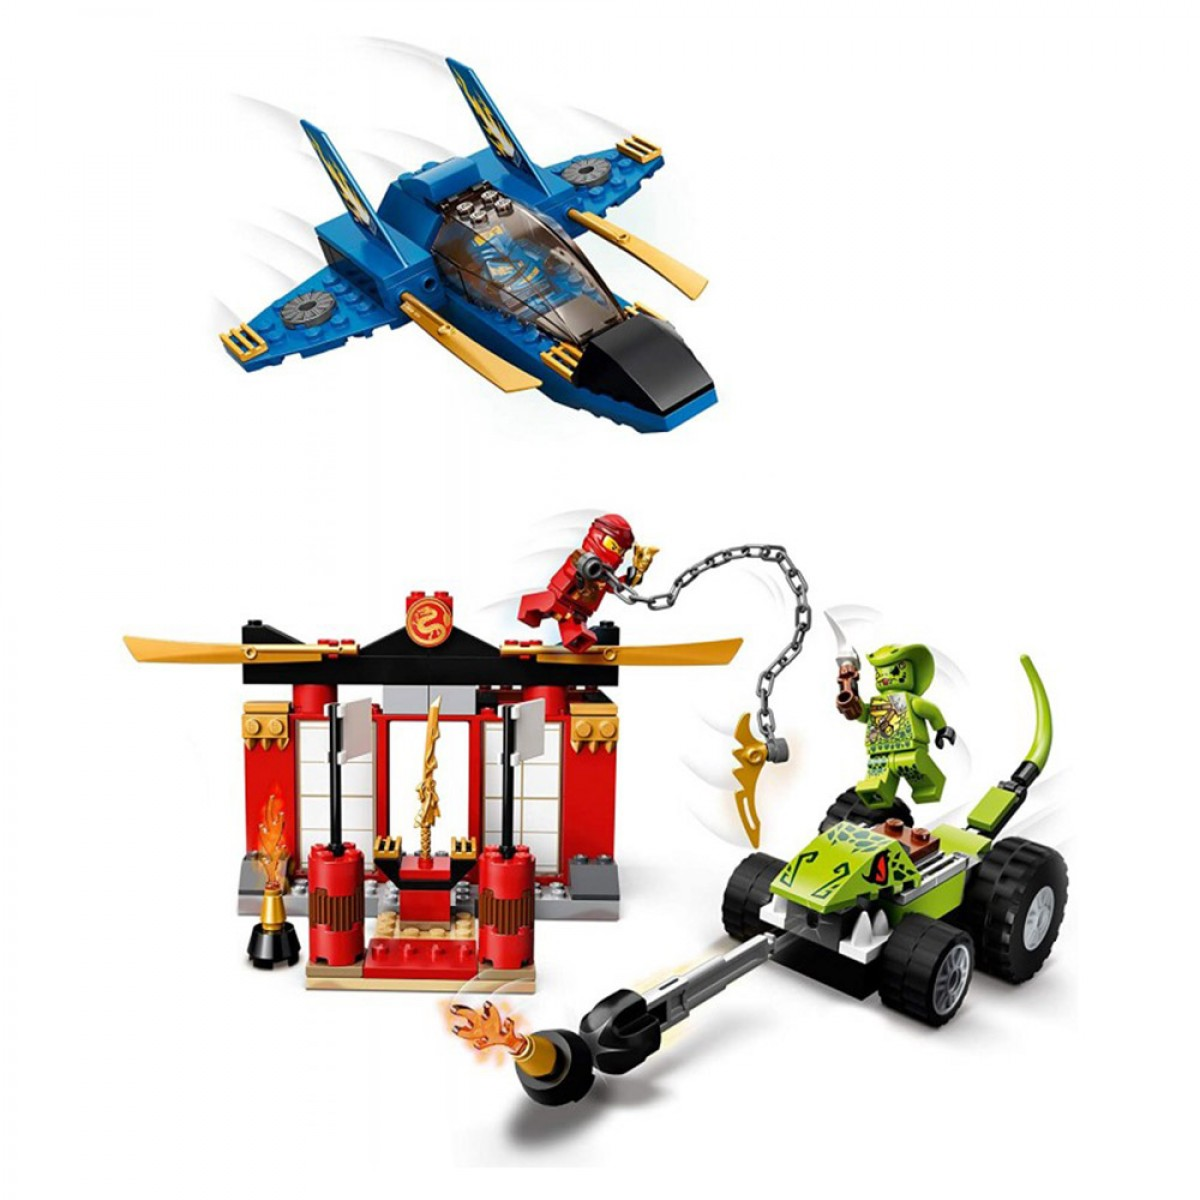 LEGO STORM FIGHTER BATTLE 71703